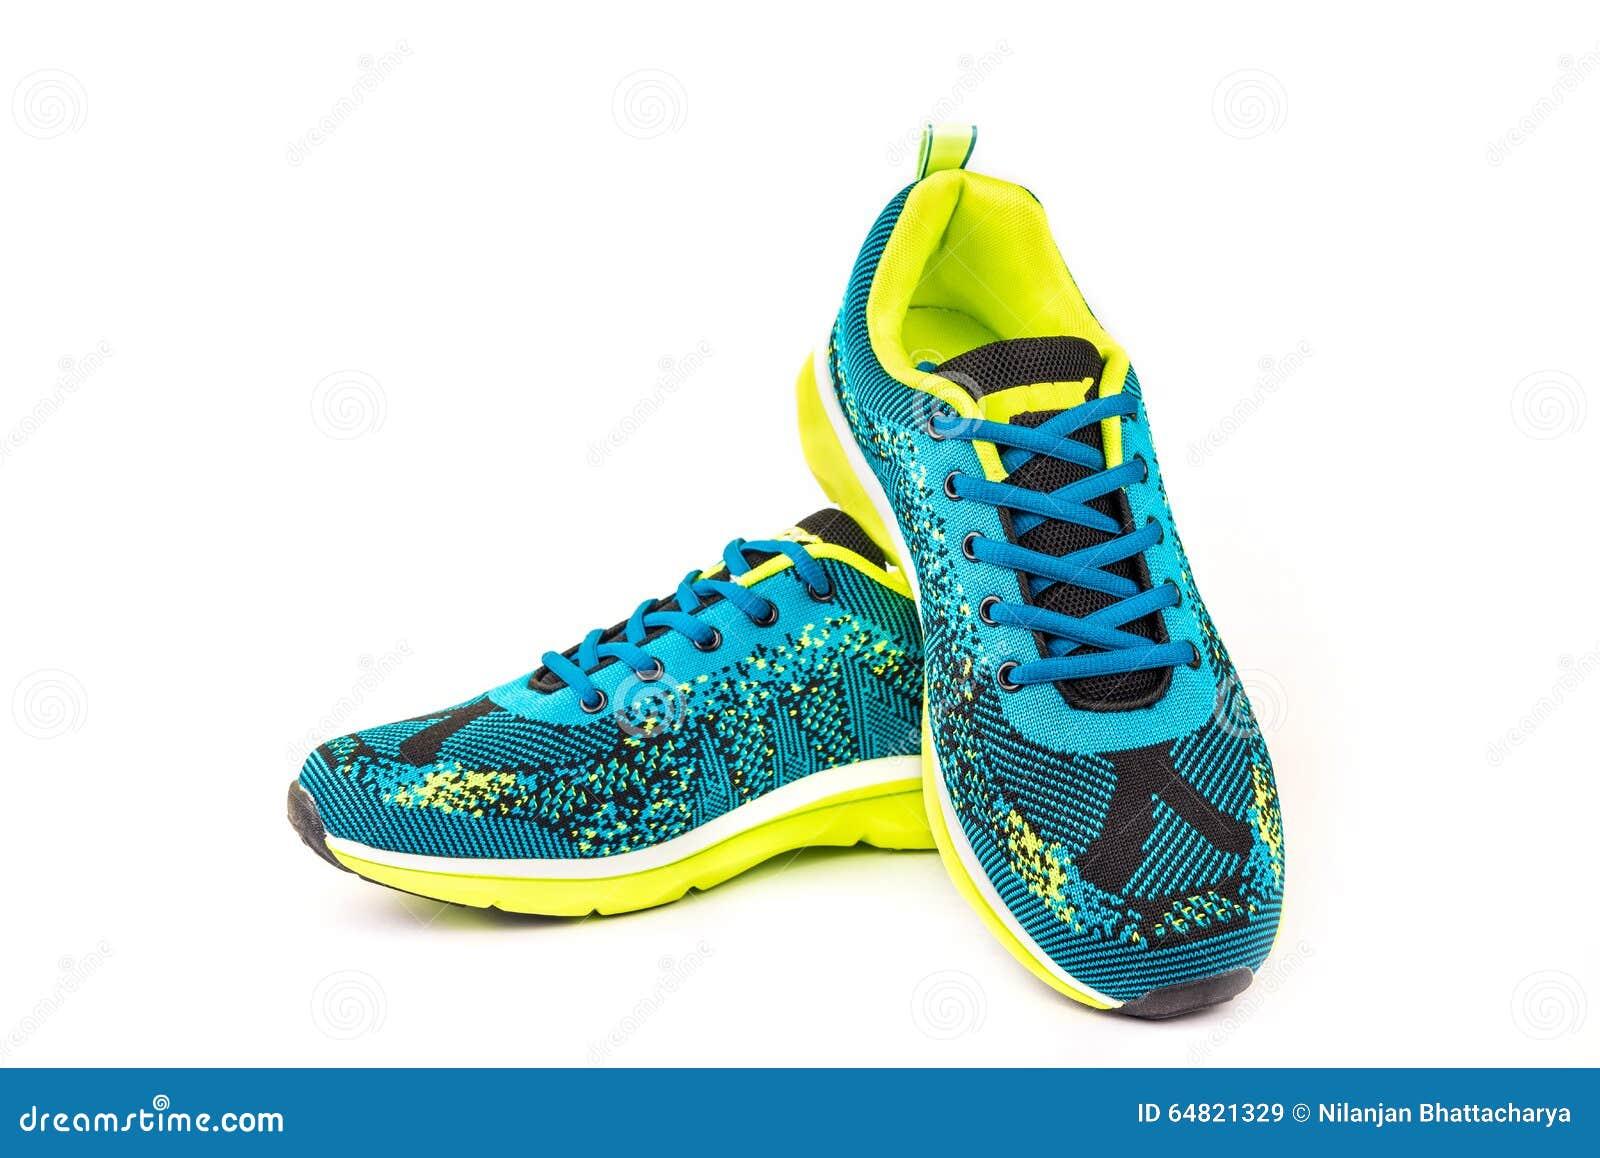 designer sport shoes stock photo image 64821329